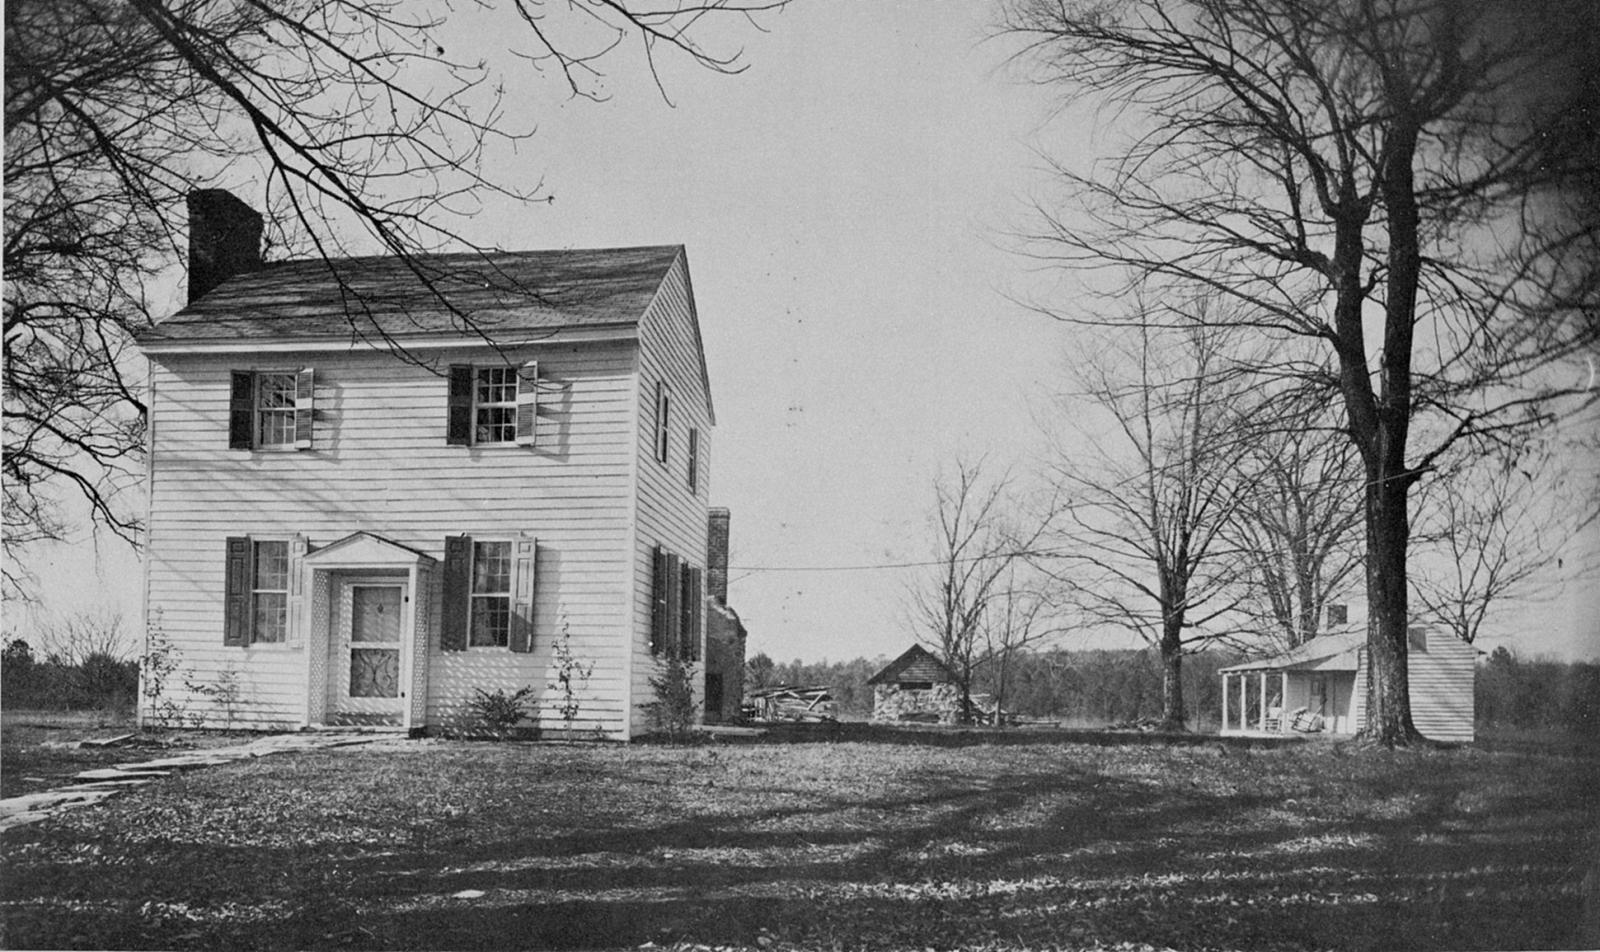 Dickson House on original lot in 1960s. Photo courtesy of openorangenc.org